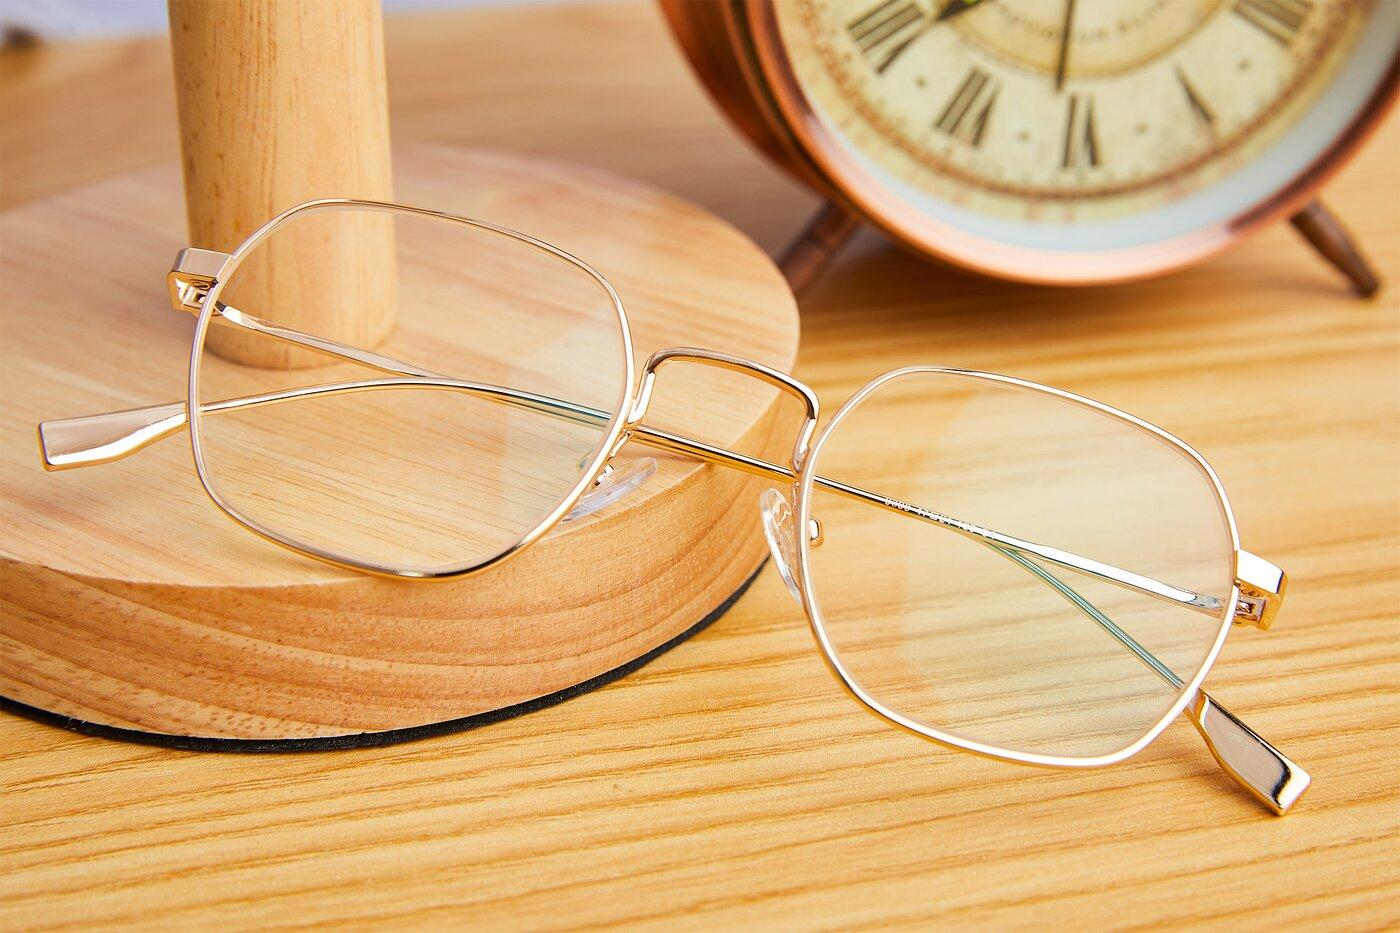 Gold Narrow Metal Geometric Eyeglasses